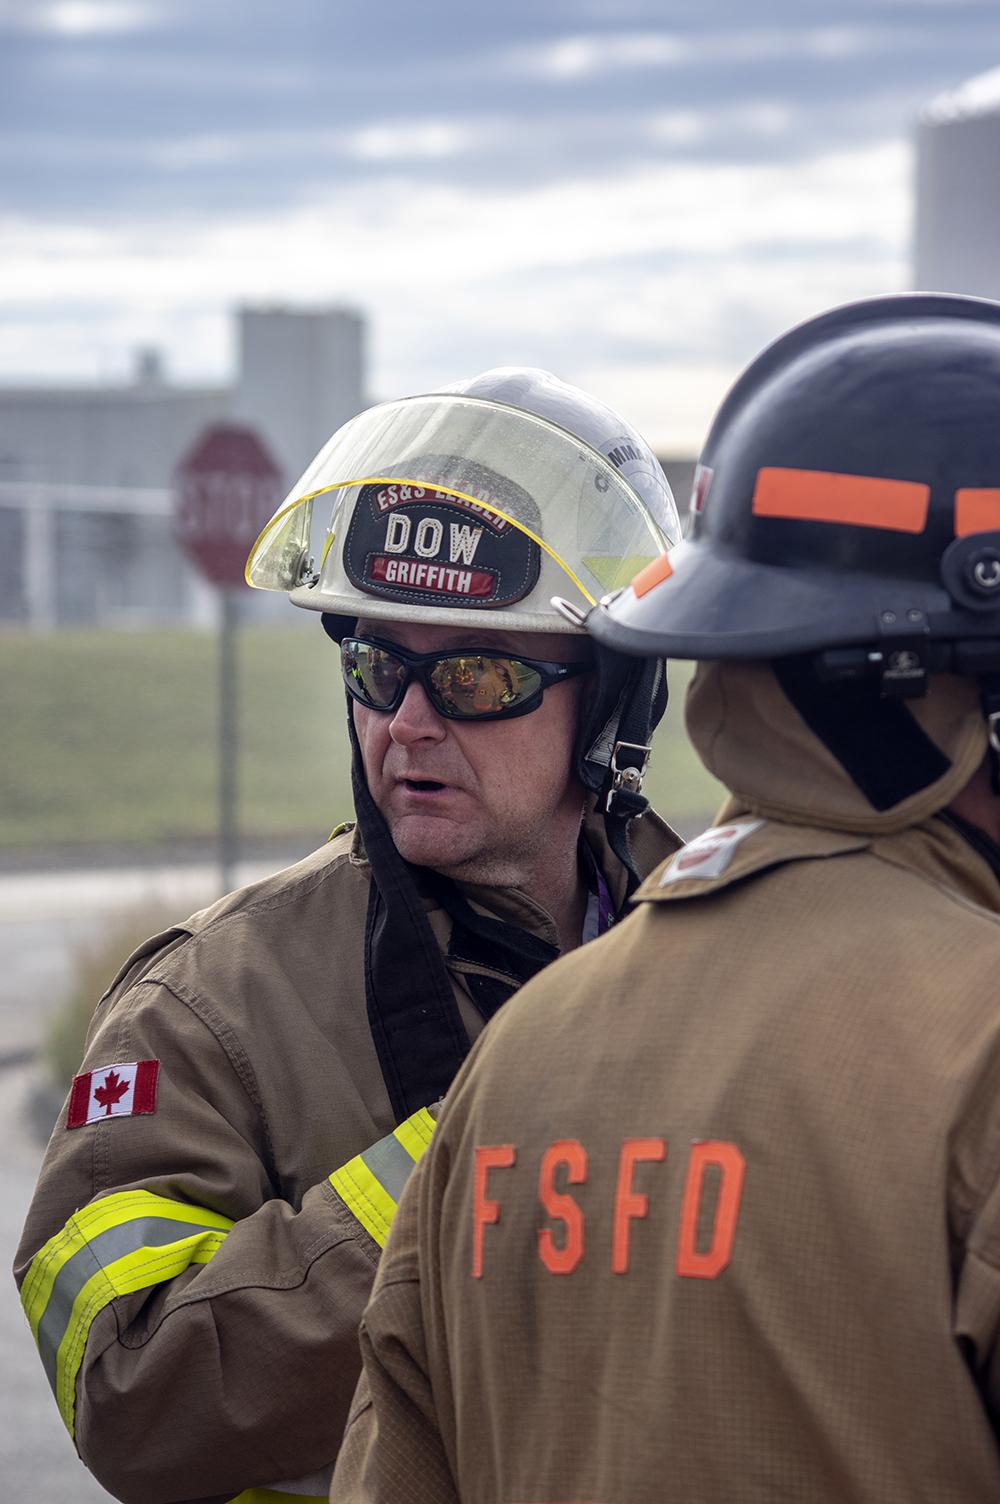 ADJ DOW - Griffith Fireman_Medium_IMG1737.jpg